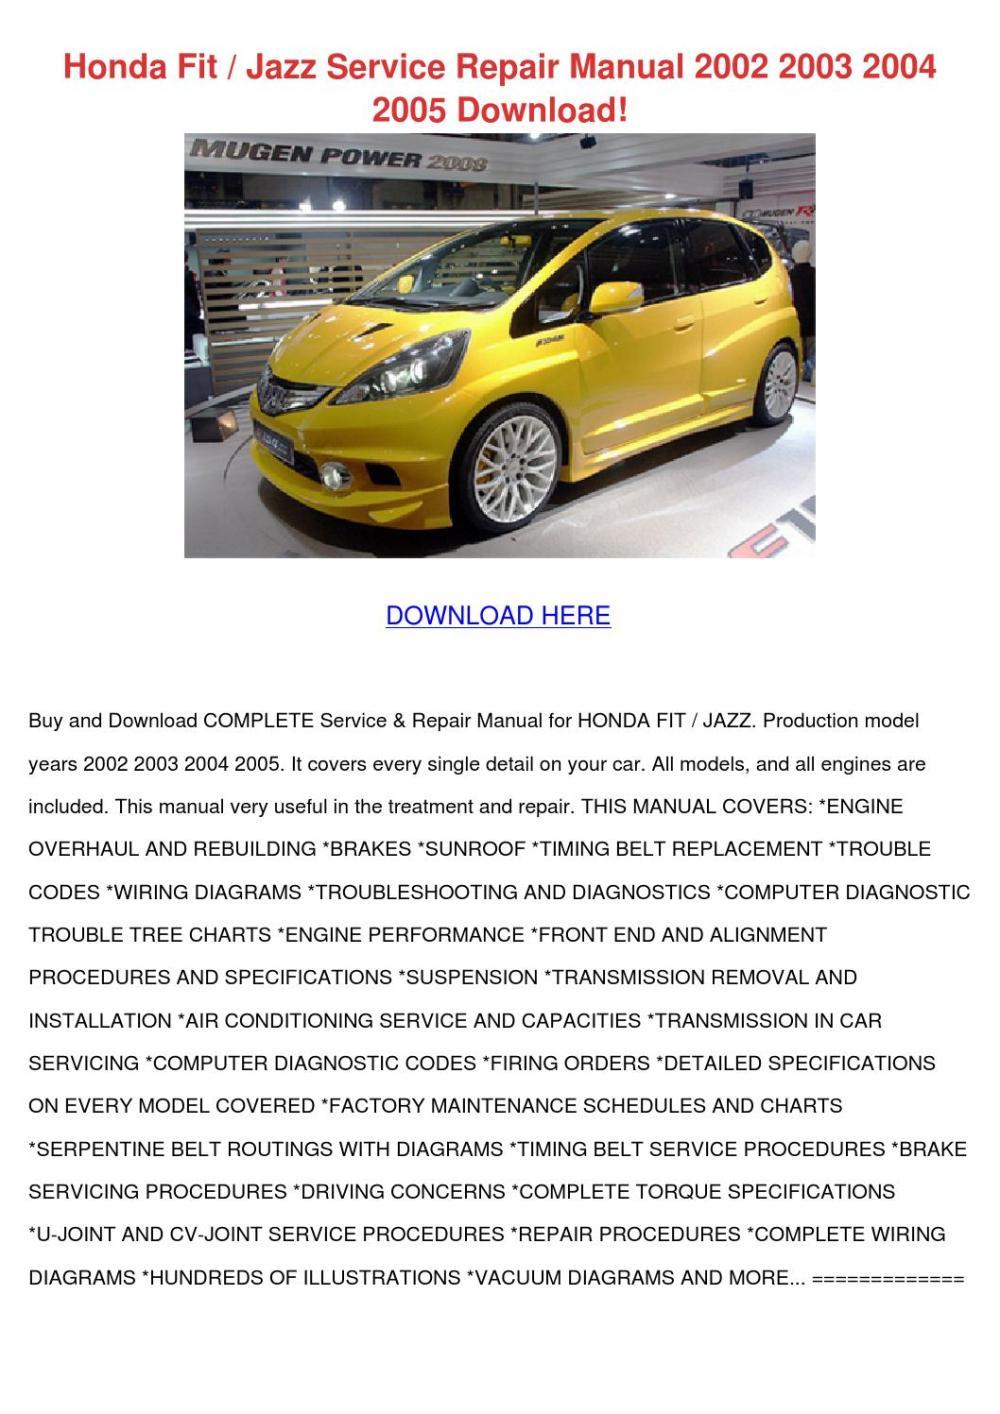 medium resolution of honda fit jazz service repair manual 2002 2003 2004 2005 download by daniel issuu